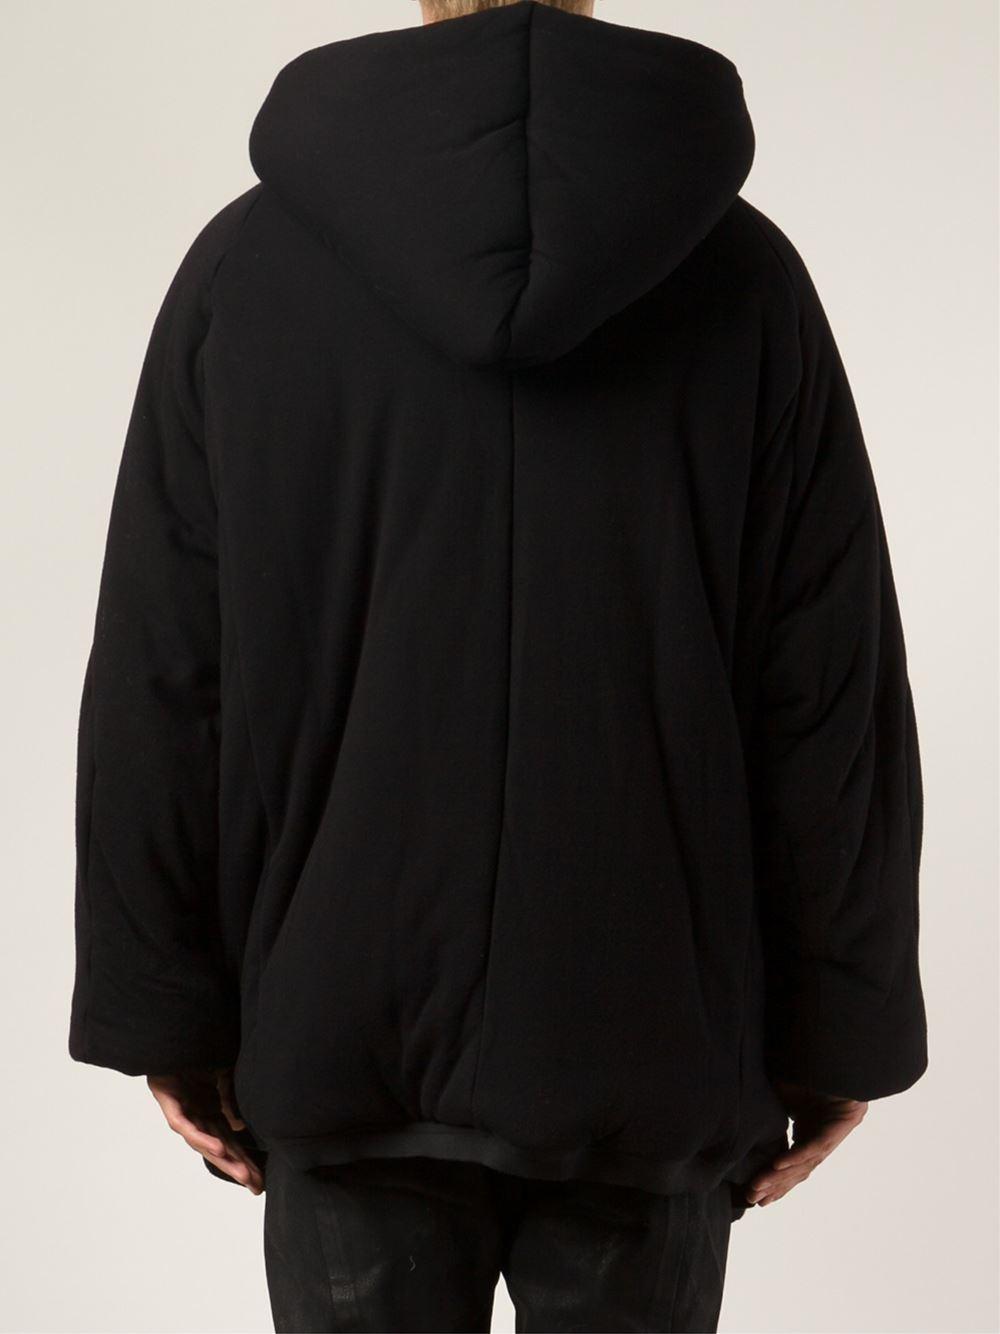 Julius oversized hooded coat - Black